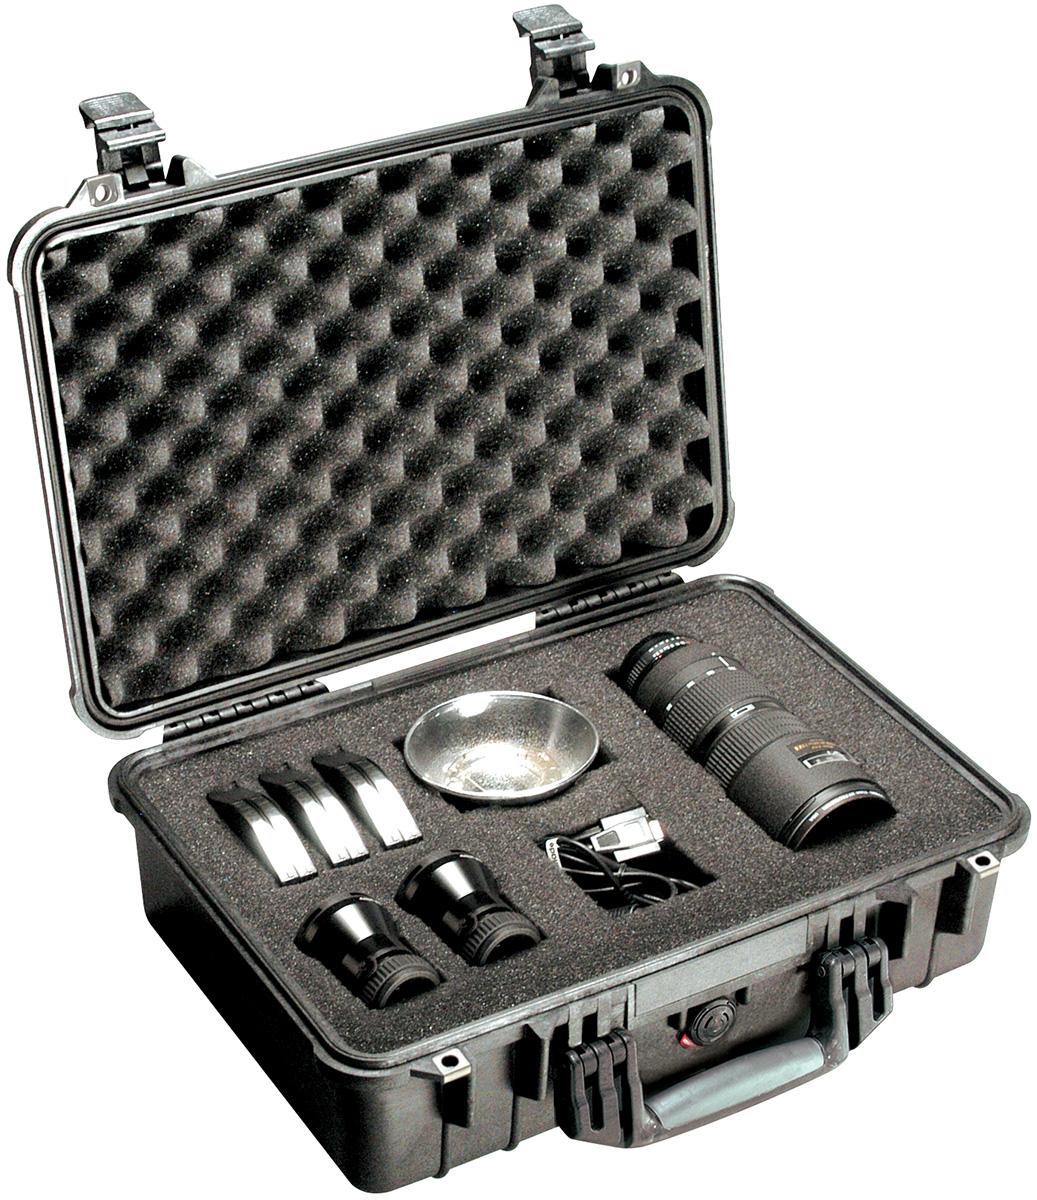 pelican peli products 1500 watertight lens photographer case